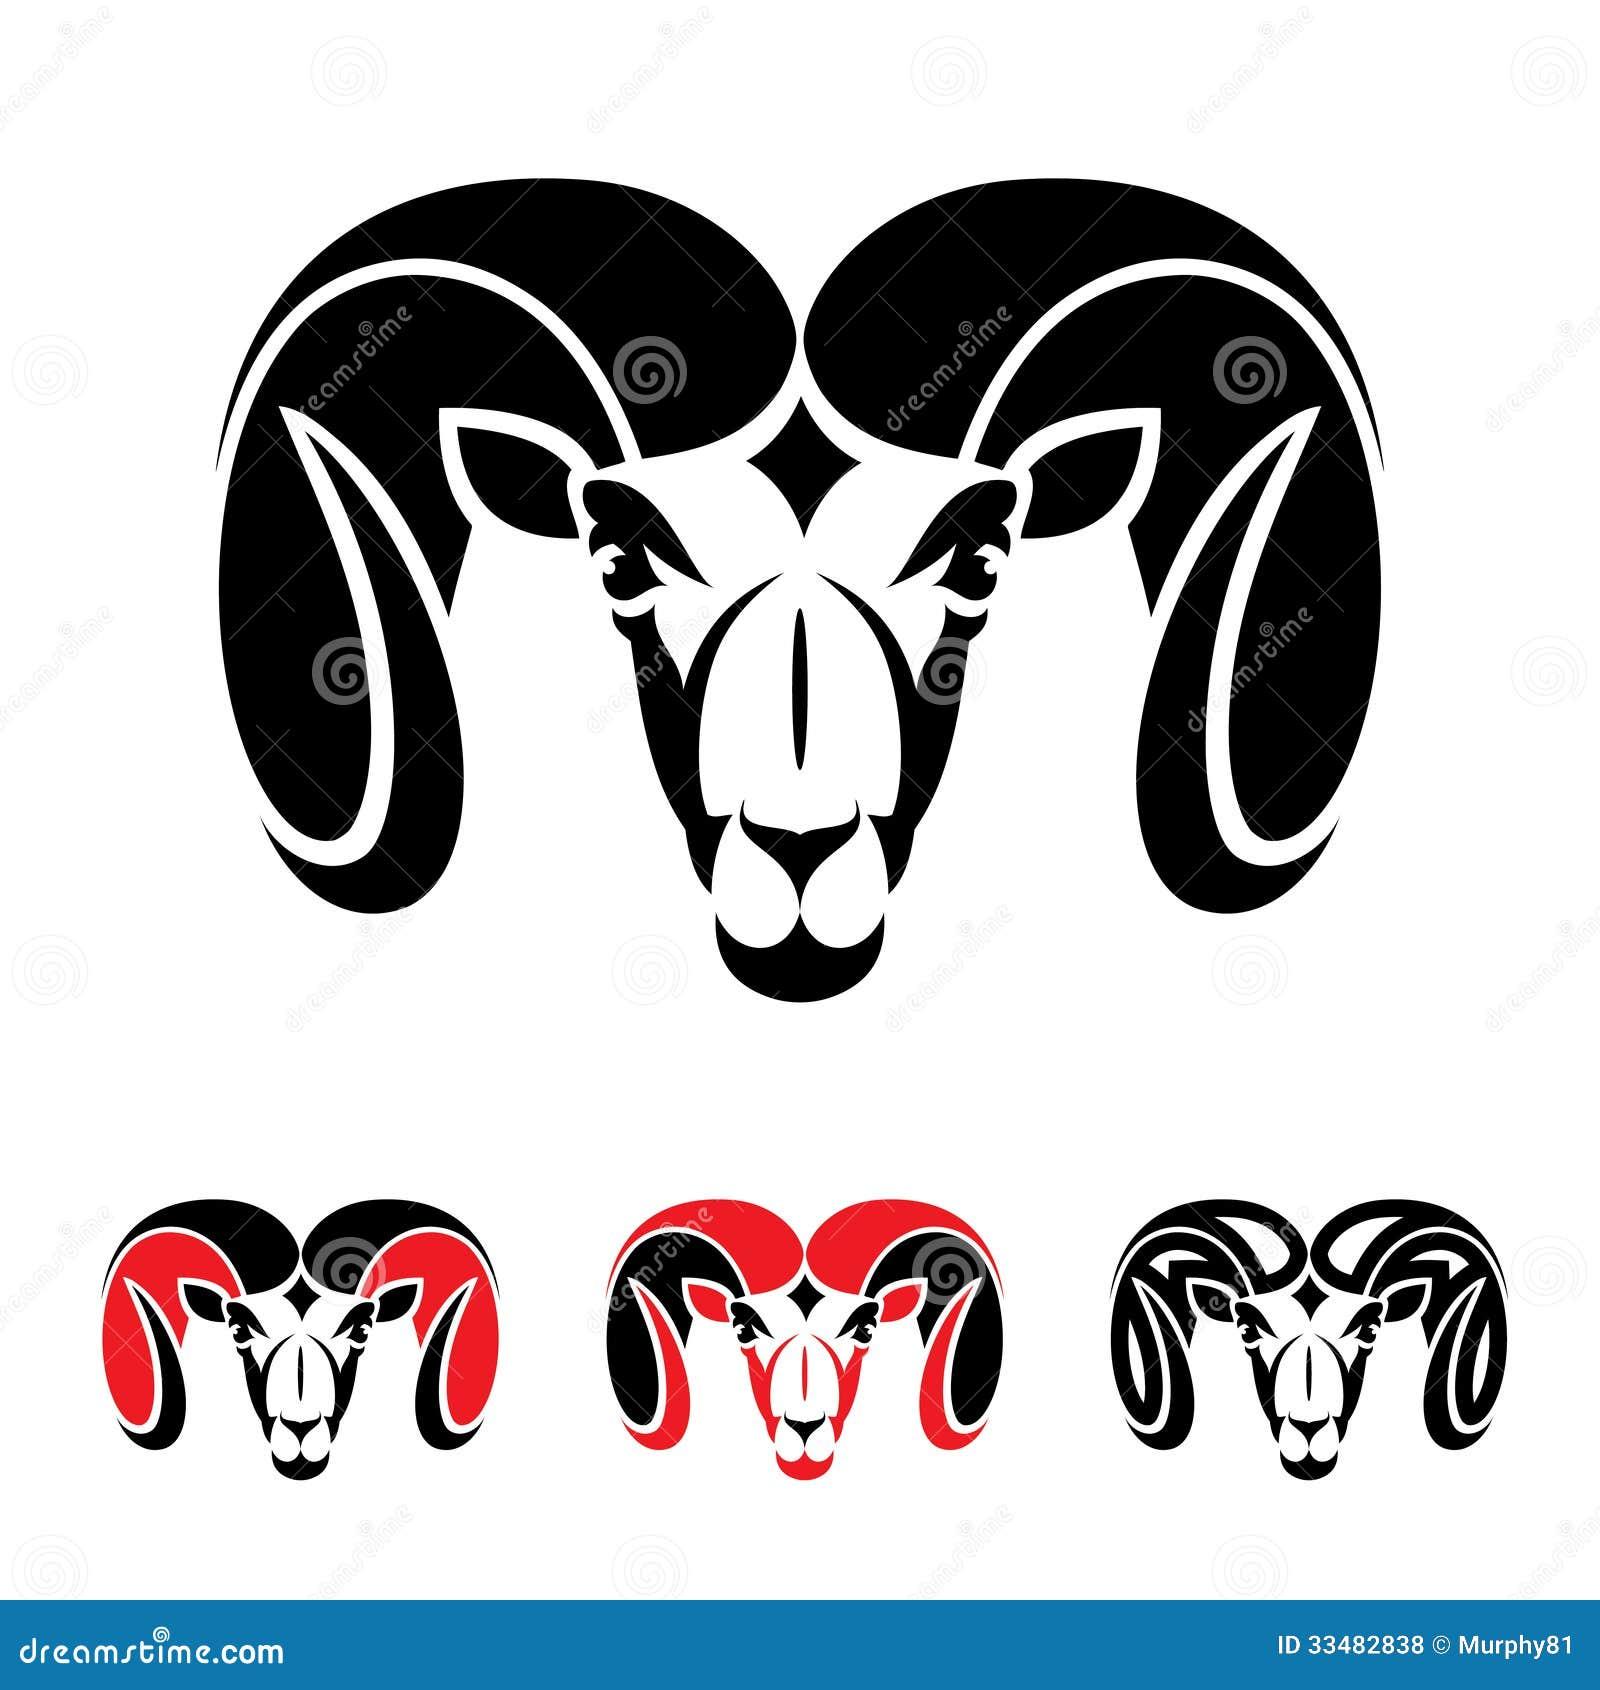 ram animal stock vector illustration of power sign 33482838